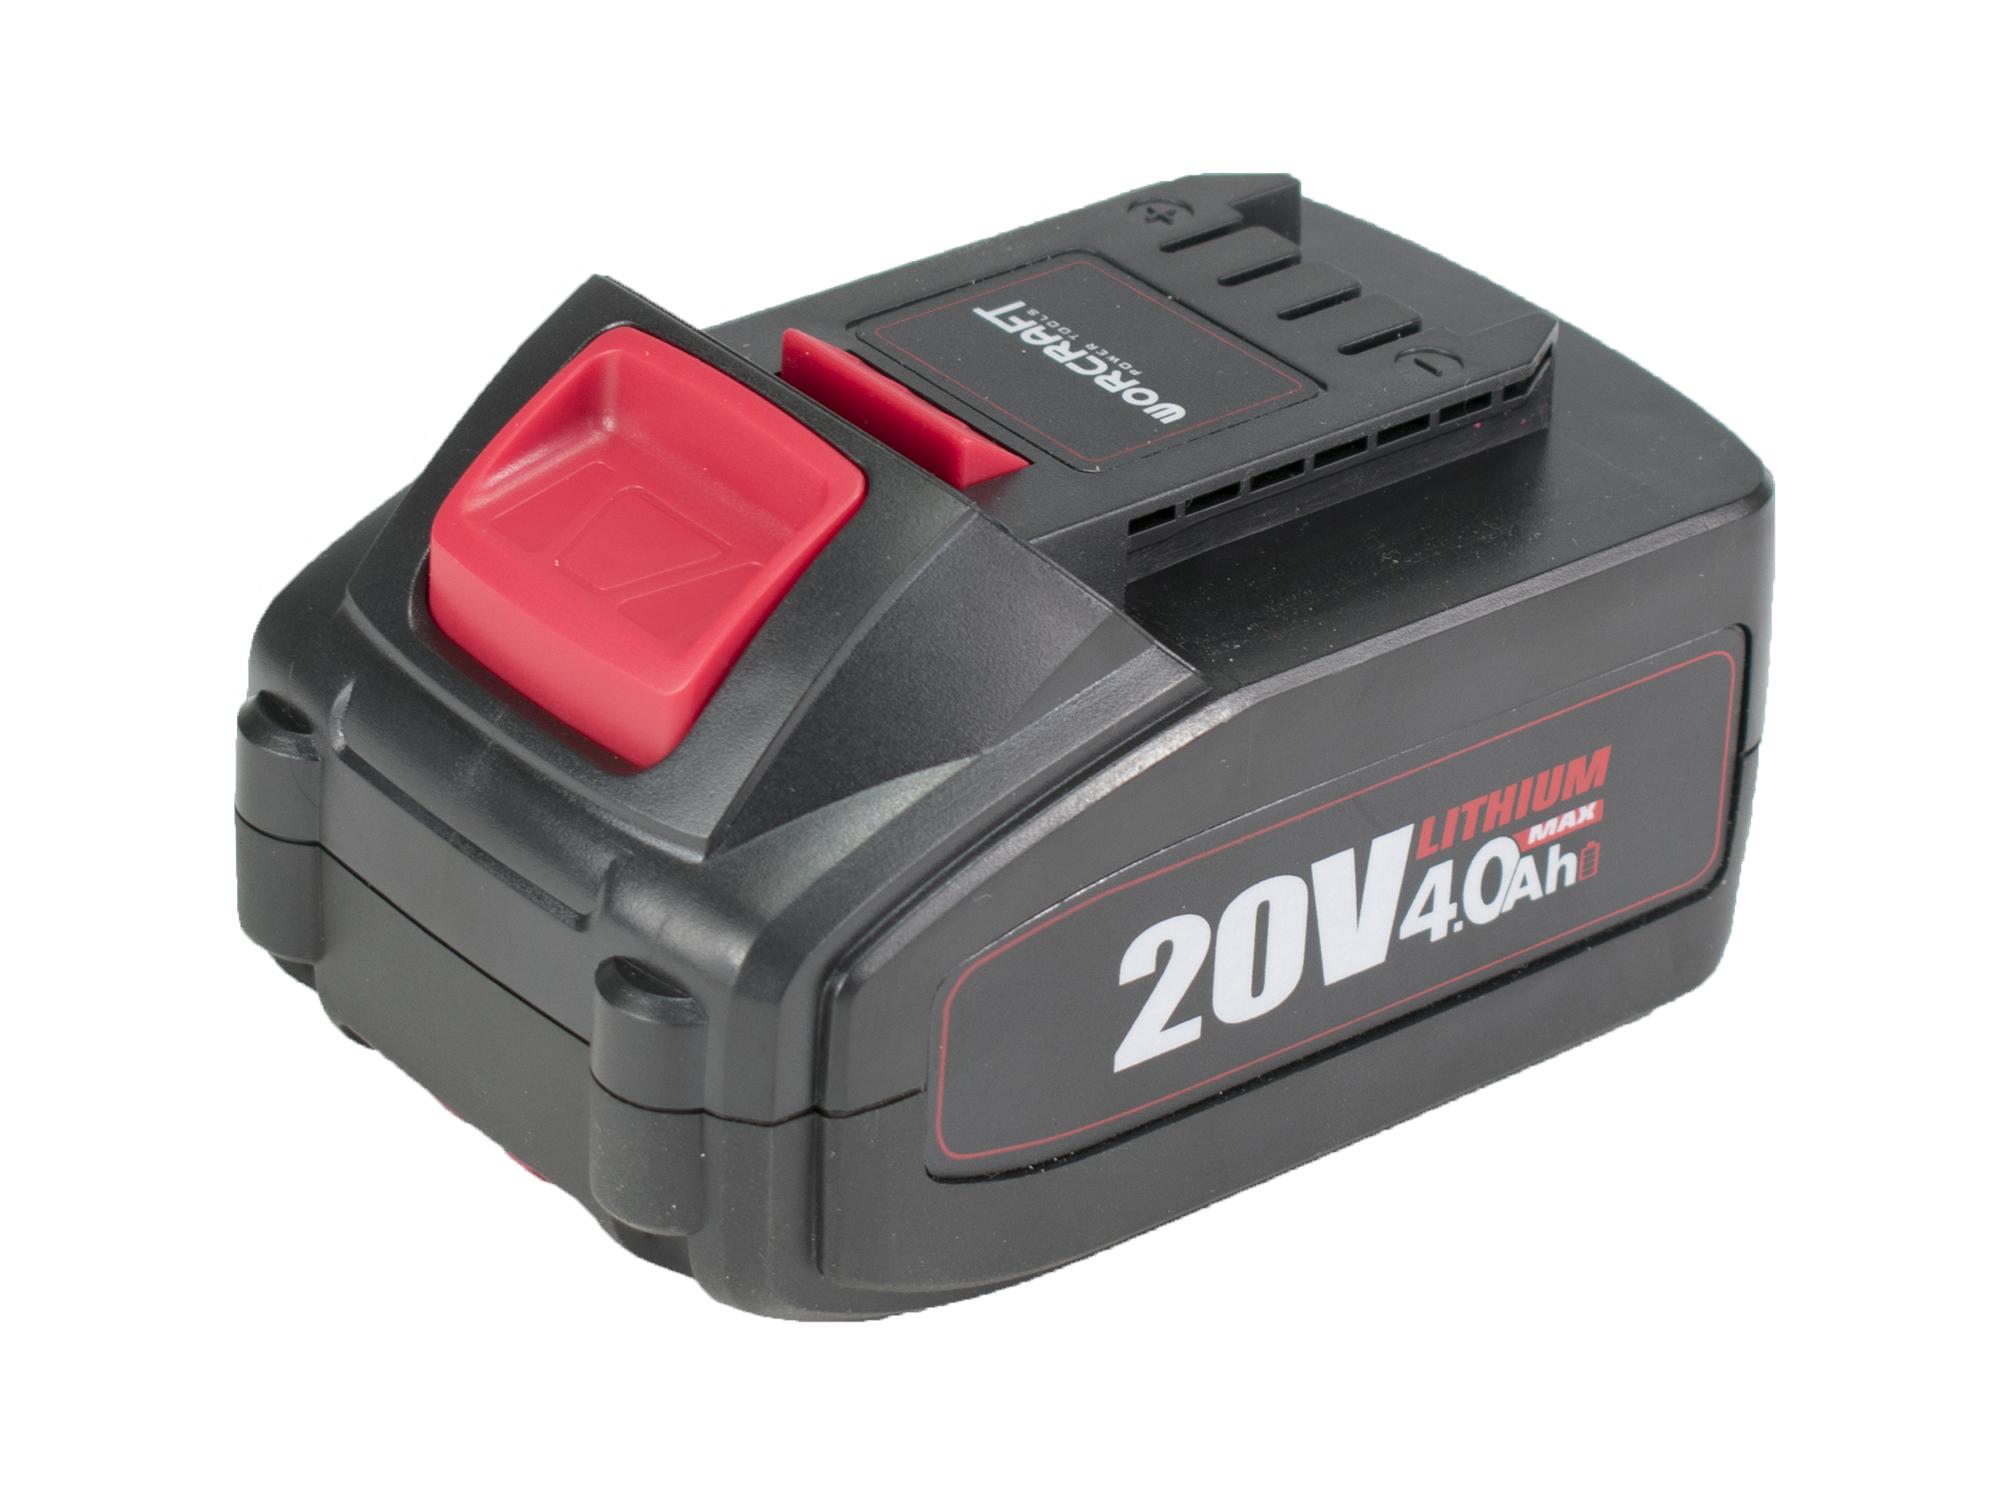 Baterie akumulátorová 20V Li-ion, 4000mAh, S20Li, WORCRAFT